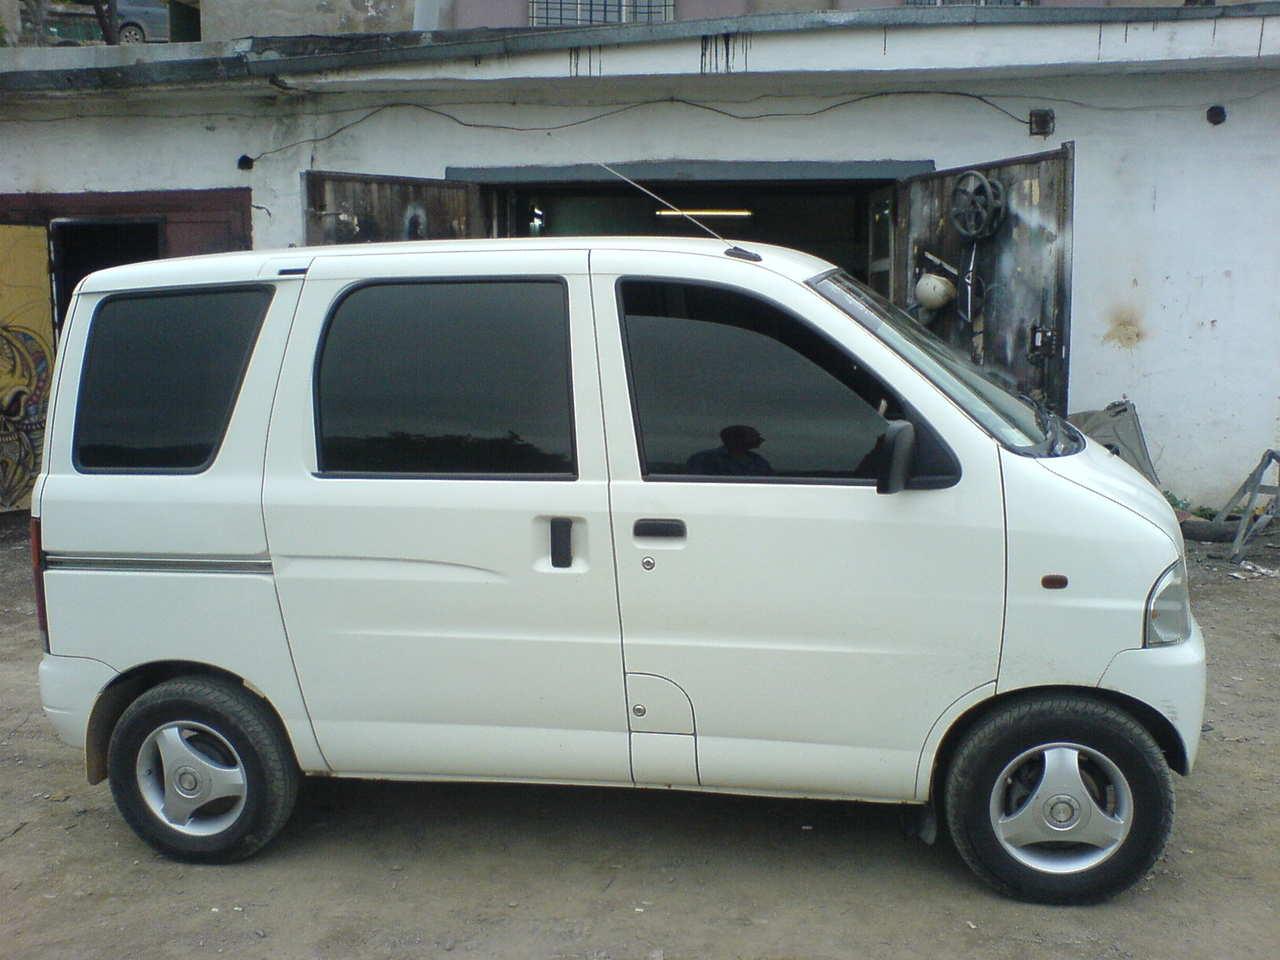 2001 Daihatsu Hijet Pictures 660cc Gasoline Manual For